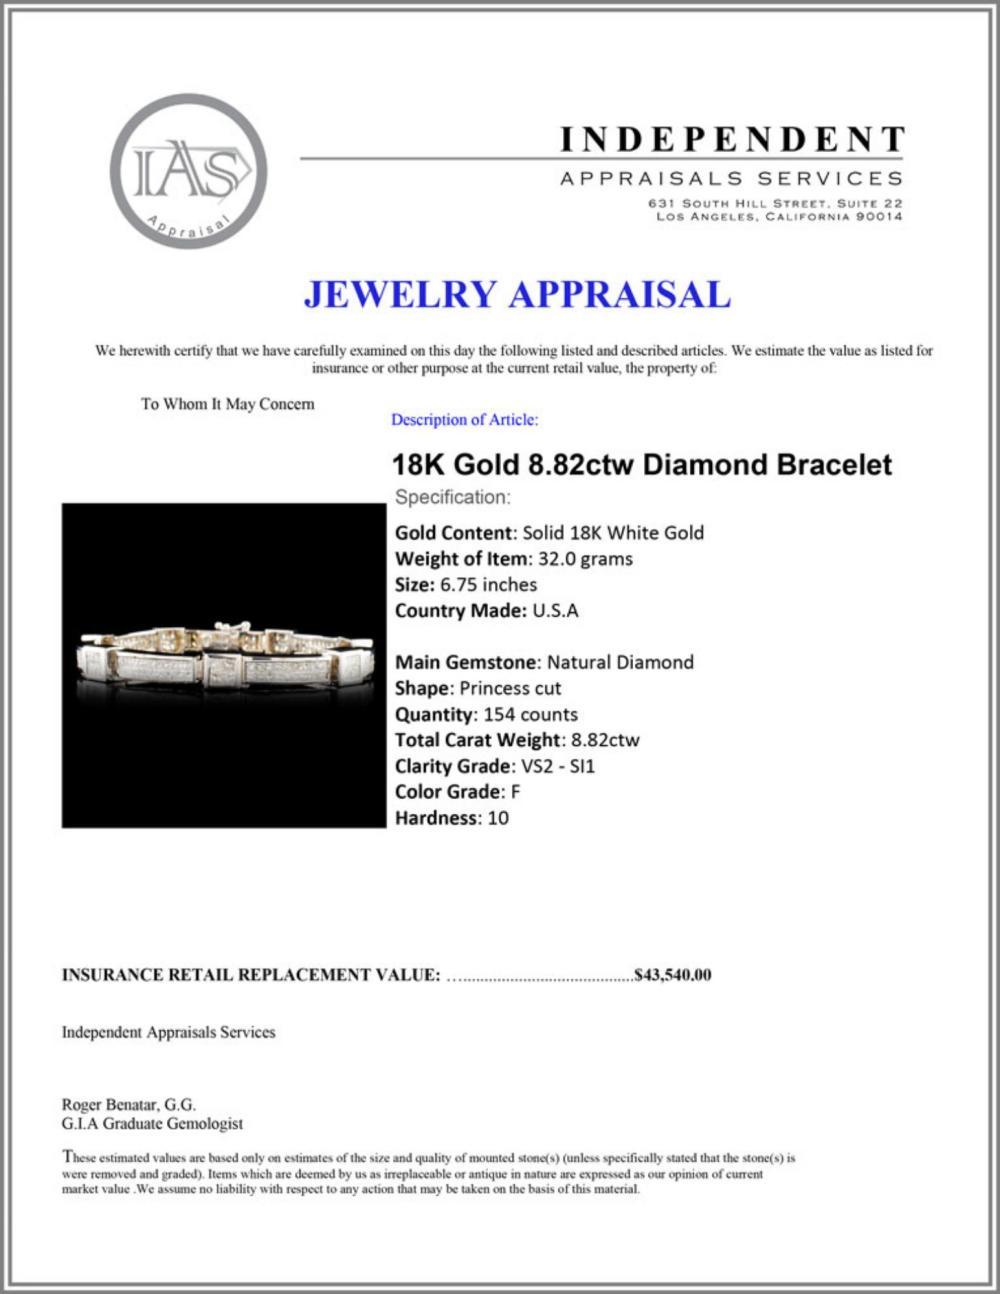 Lot 23: 18K Gold 8.82ctw Diamond Bracelet